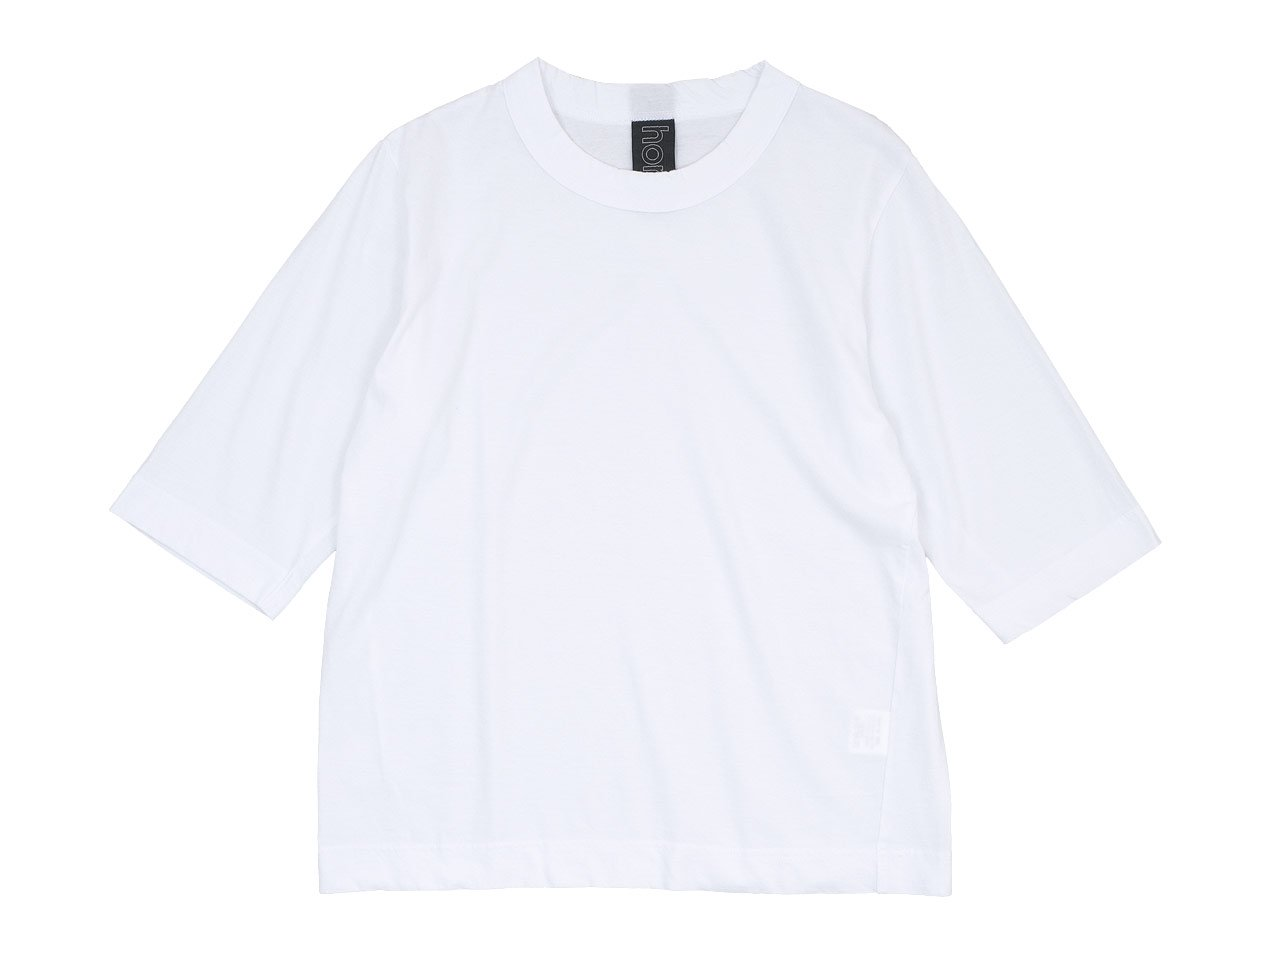 homspun 30/1天竺 六分袖Tシャツ サラシ